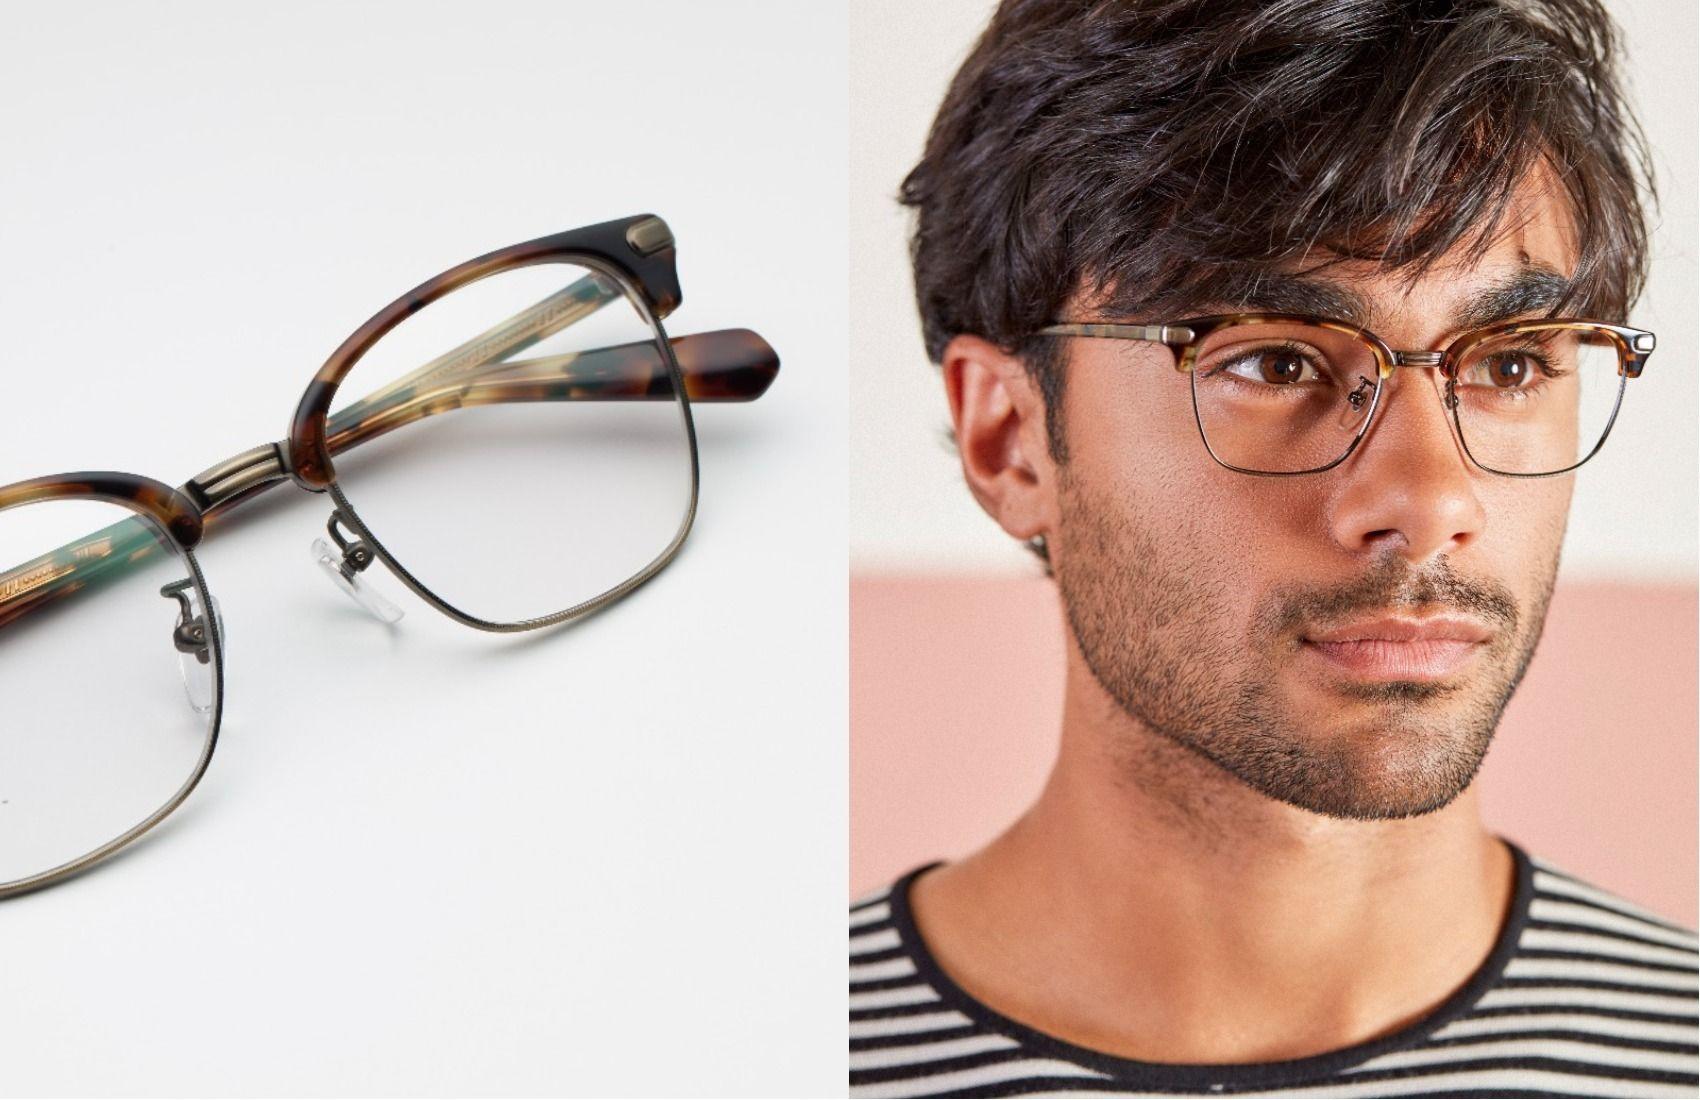 712ac555355 2018 eyewear style trends retro glasses